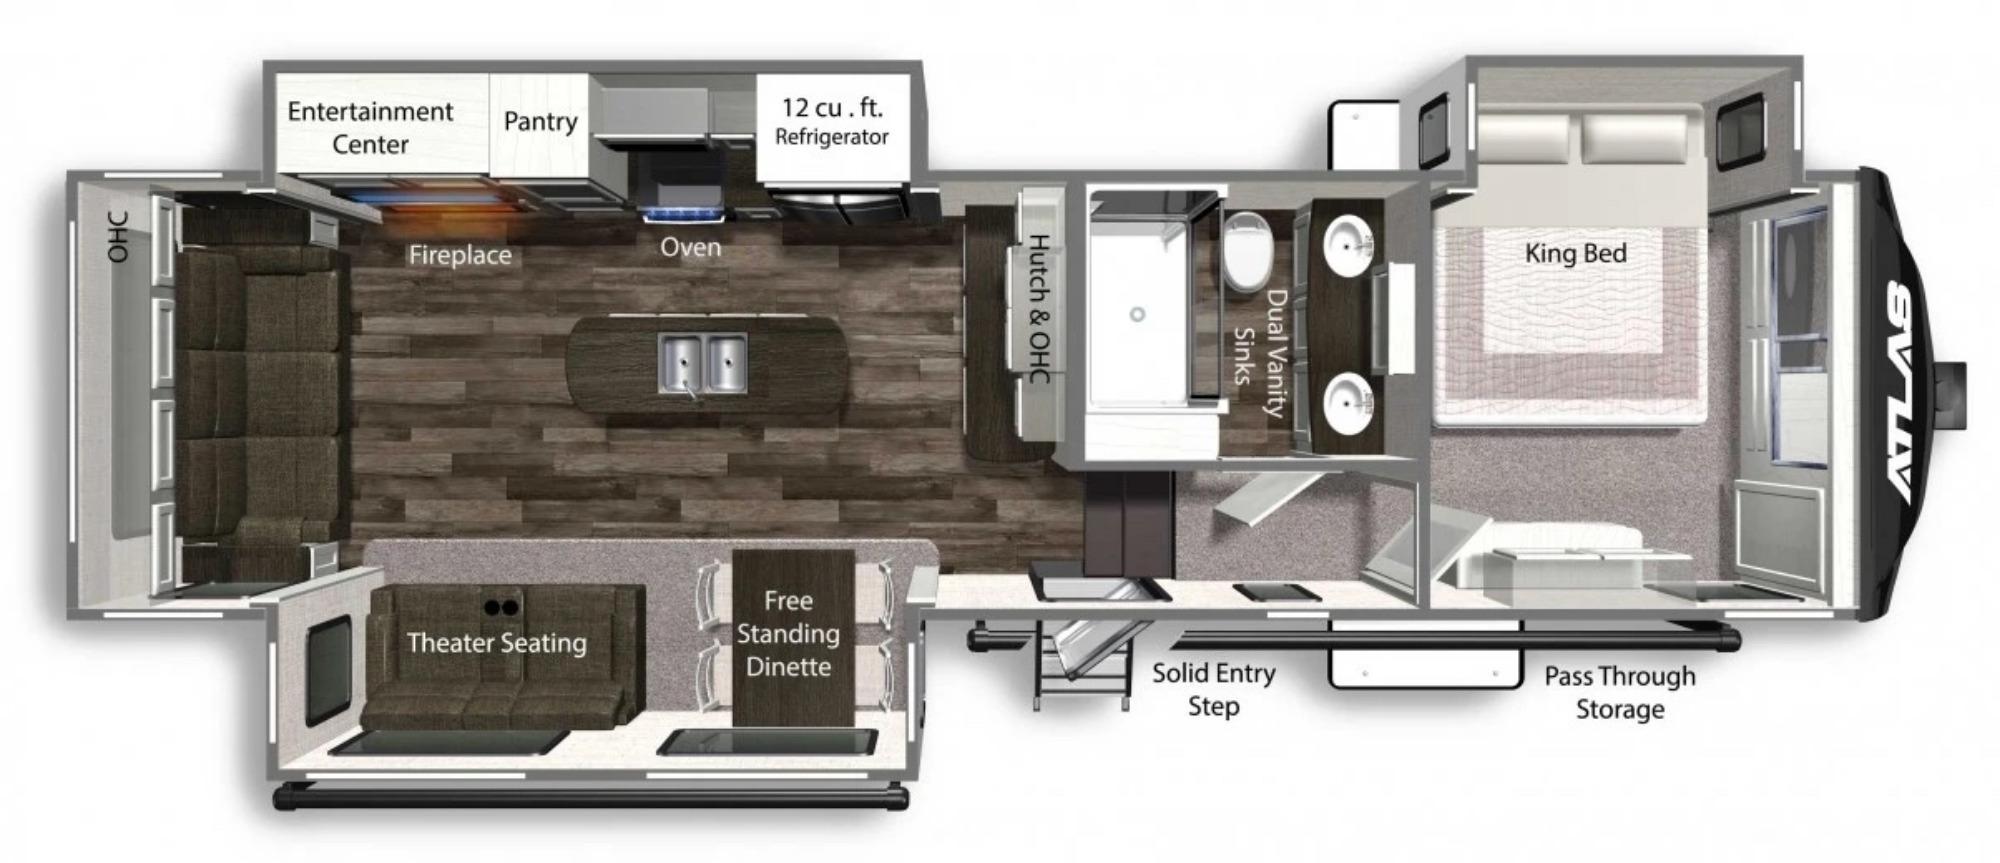 View Floor Plan for 2022 DUTCHMEN ATLAS 3172RLKB